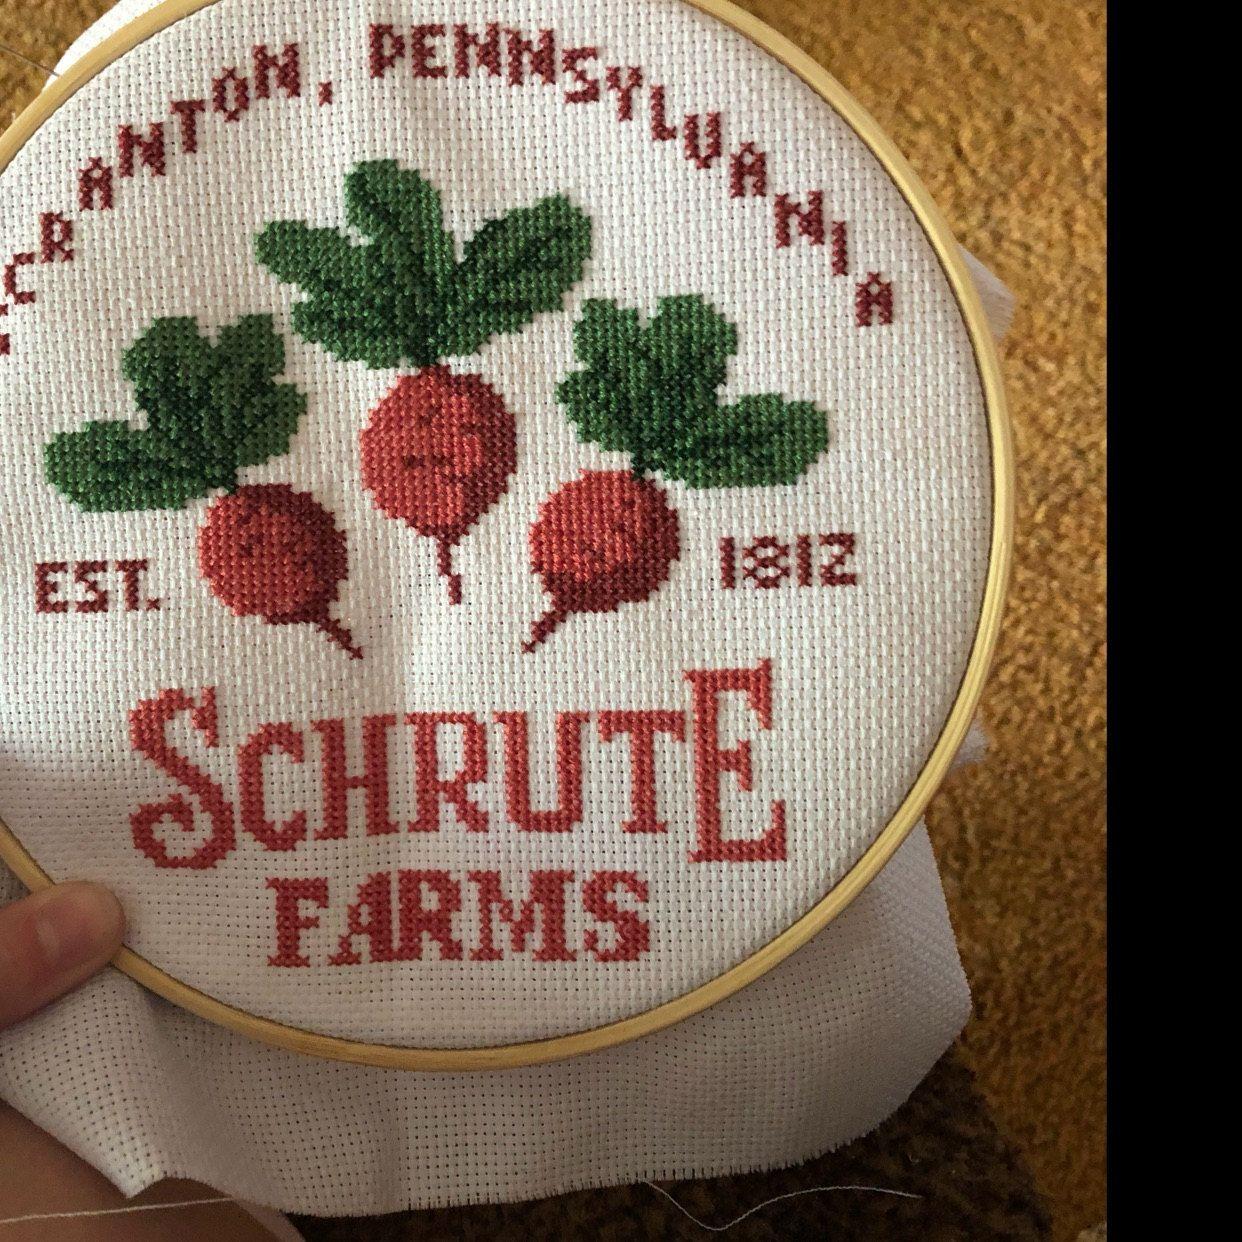 Photo of Schrute Farms Cross Stitch Pattern, Office Cross Stitch Pattern, TV Show Pattern, Modern Cross Stitch Pattern, Download PDF #tv014